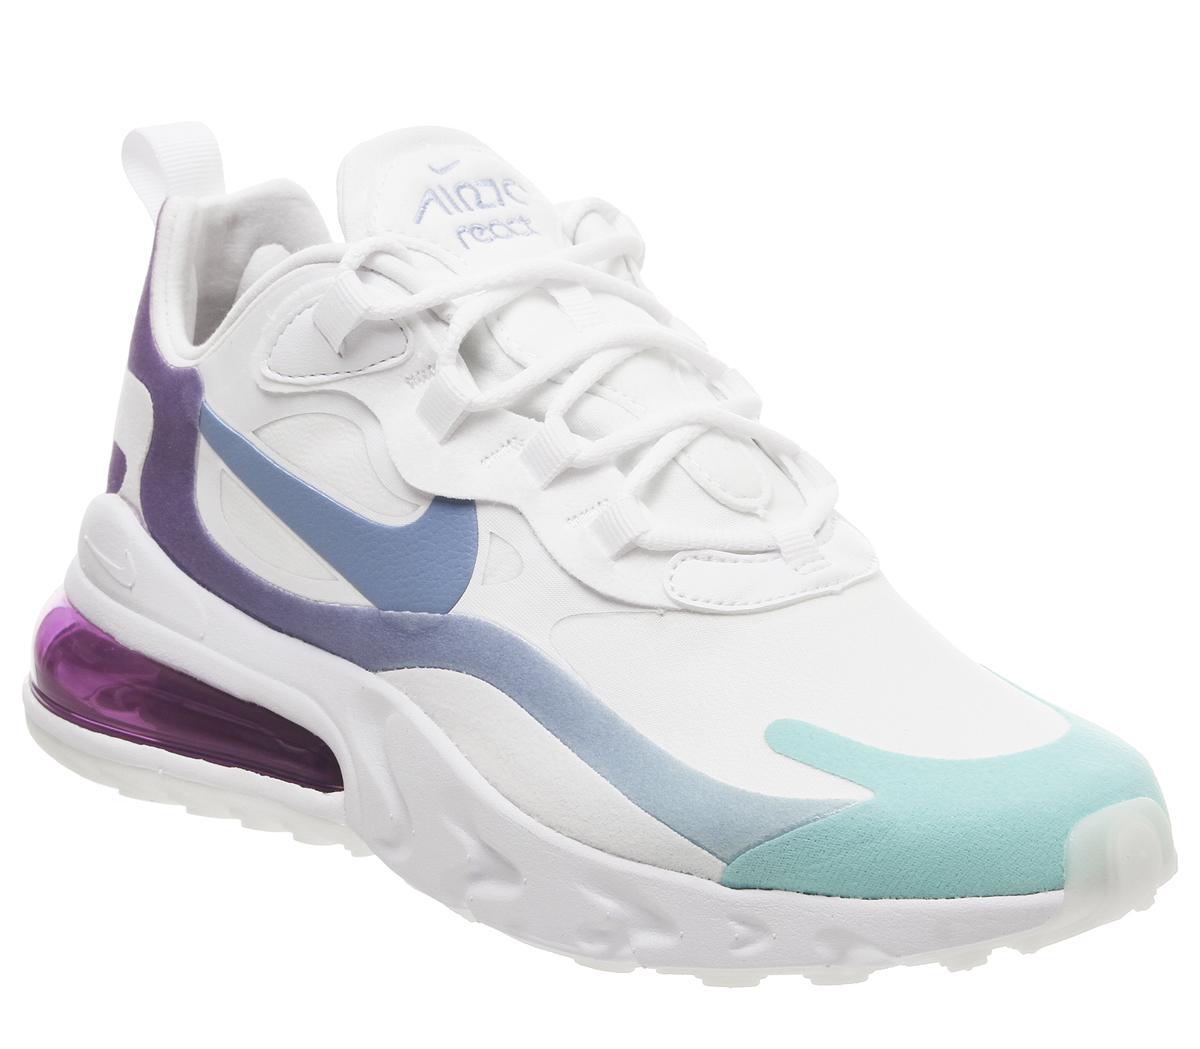 nike air max 270 white and purple